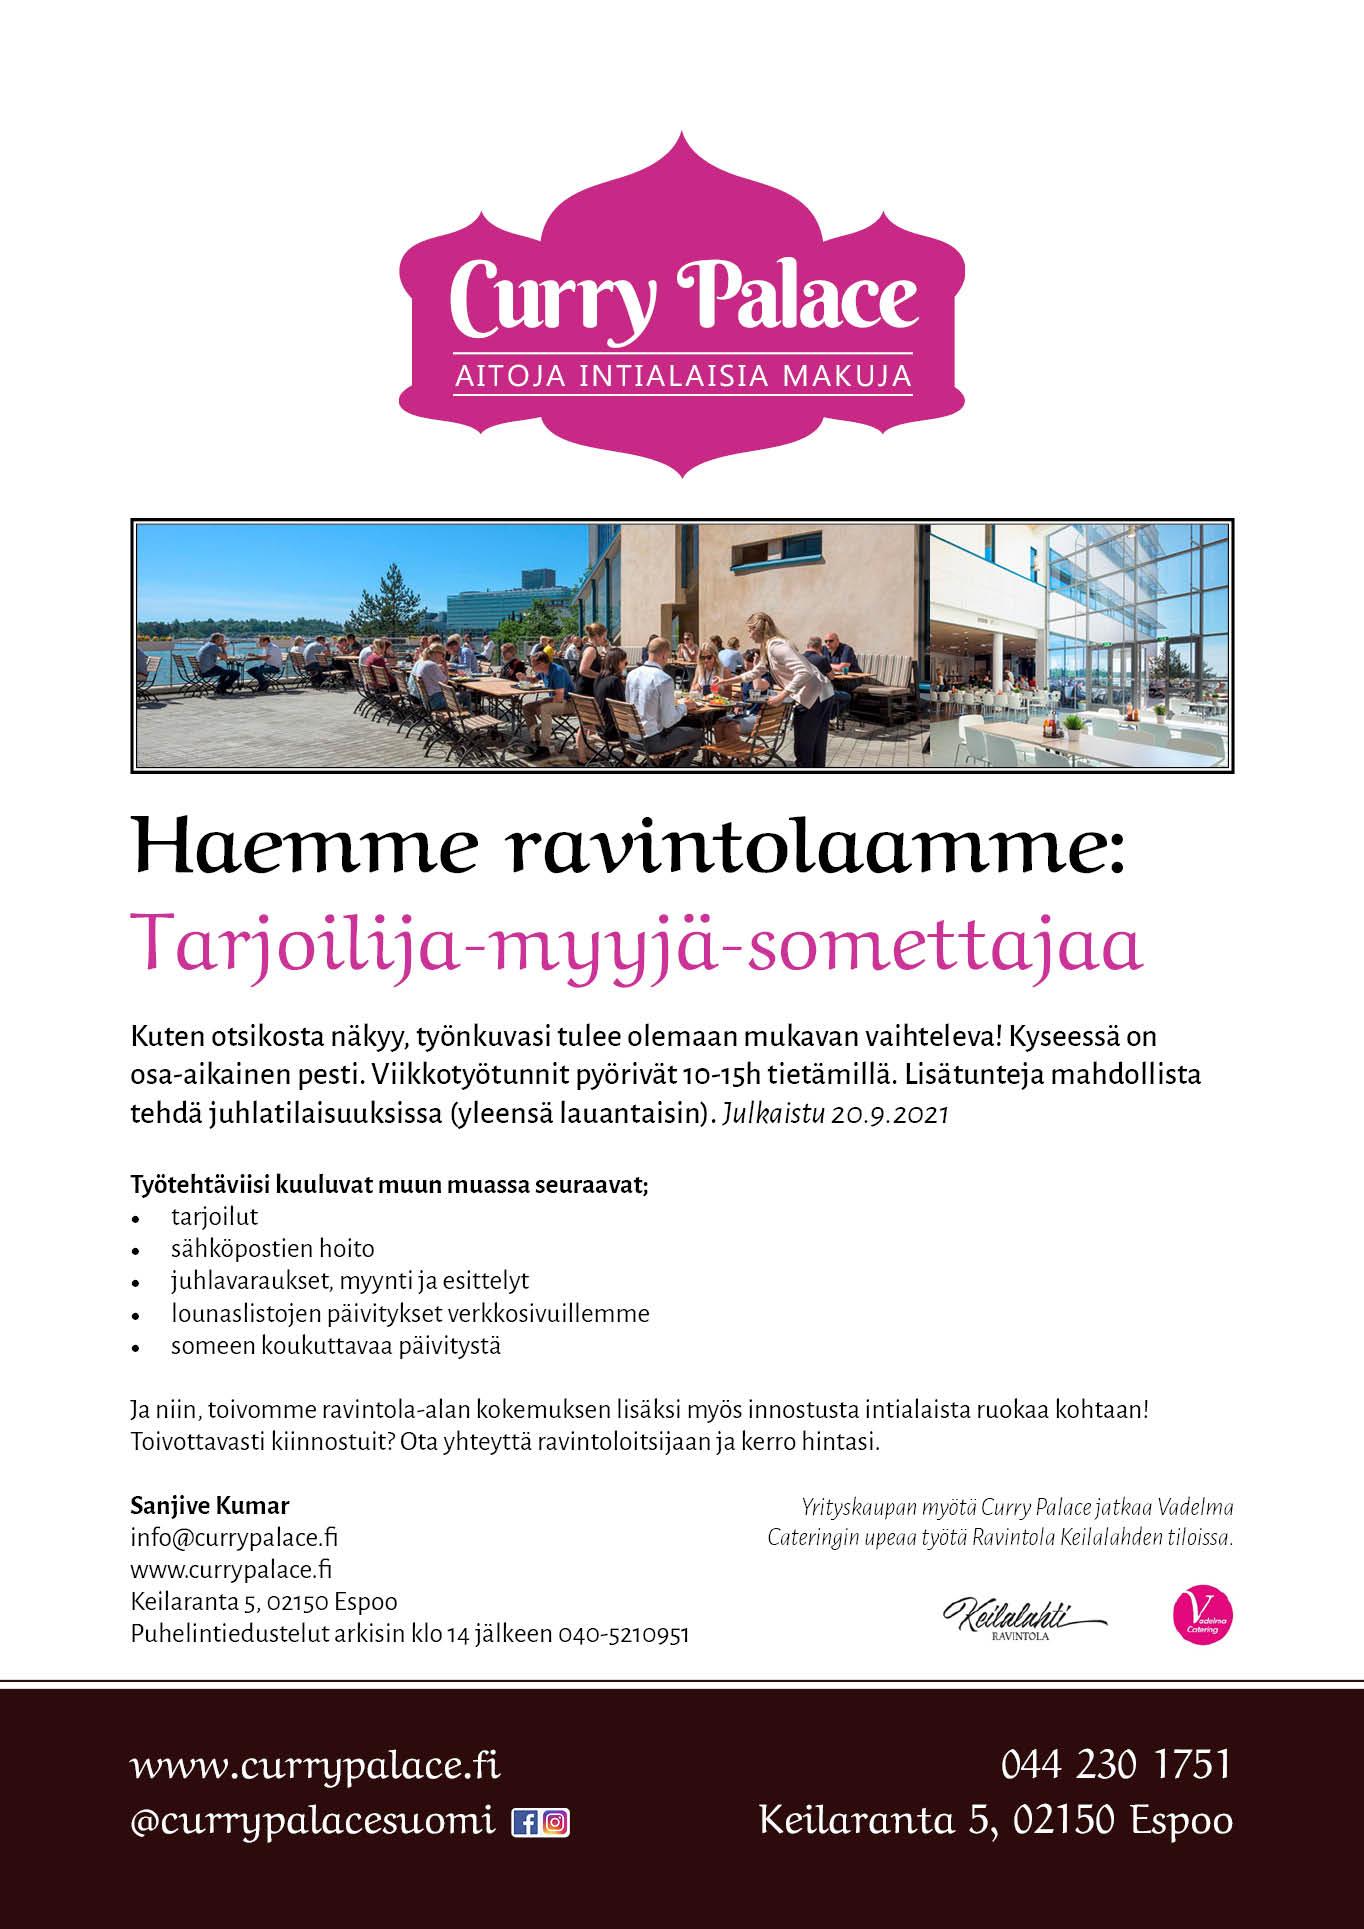 Curry Palace rekrytointi 9-2021